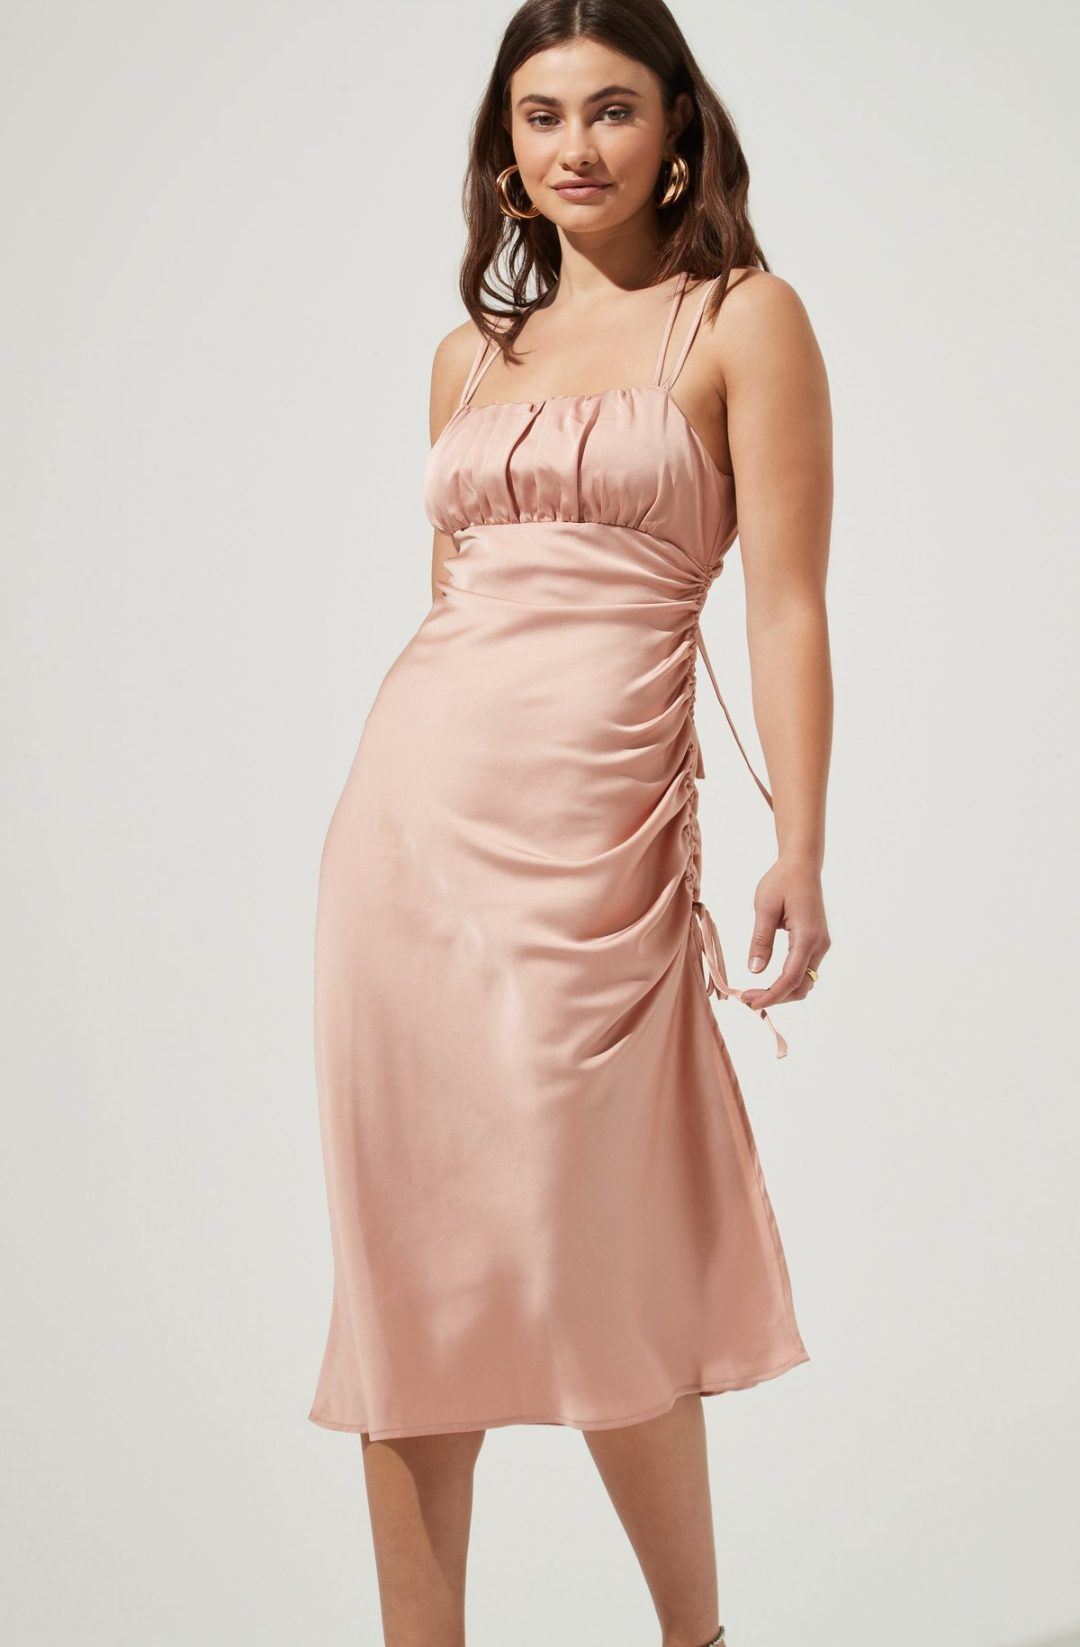 Dusty pink satin runched midi dress